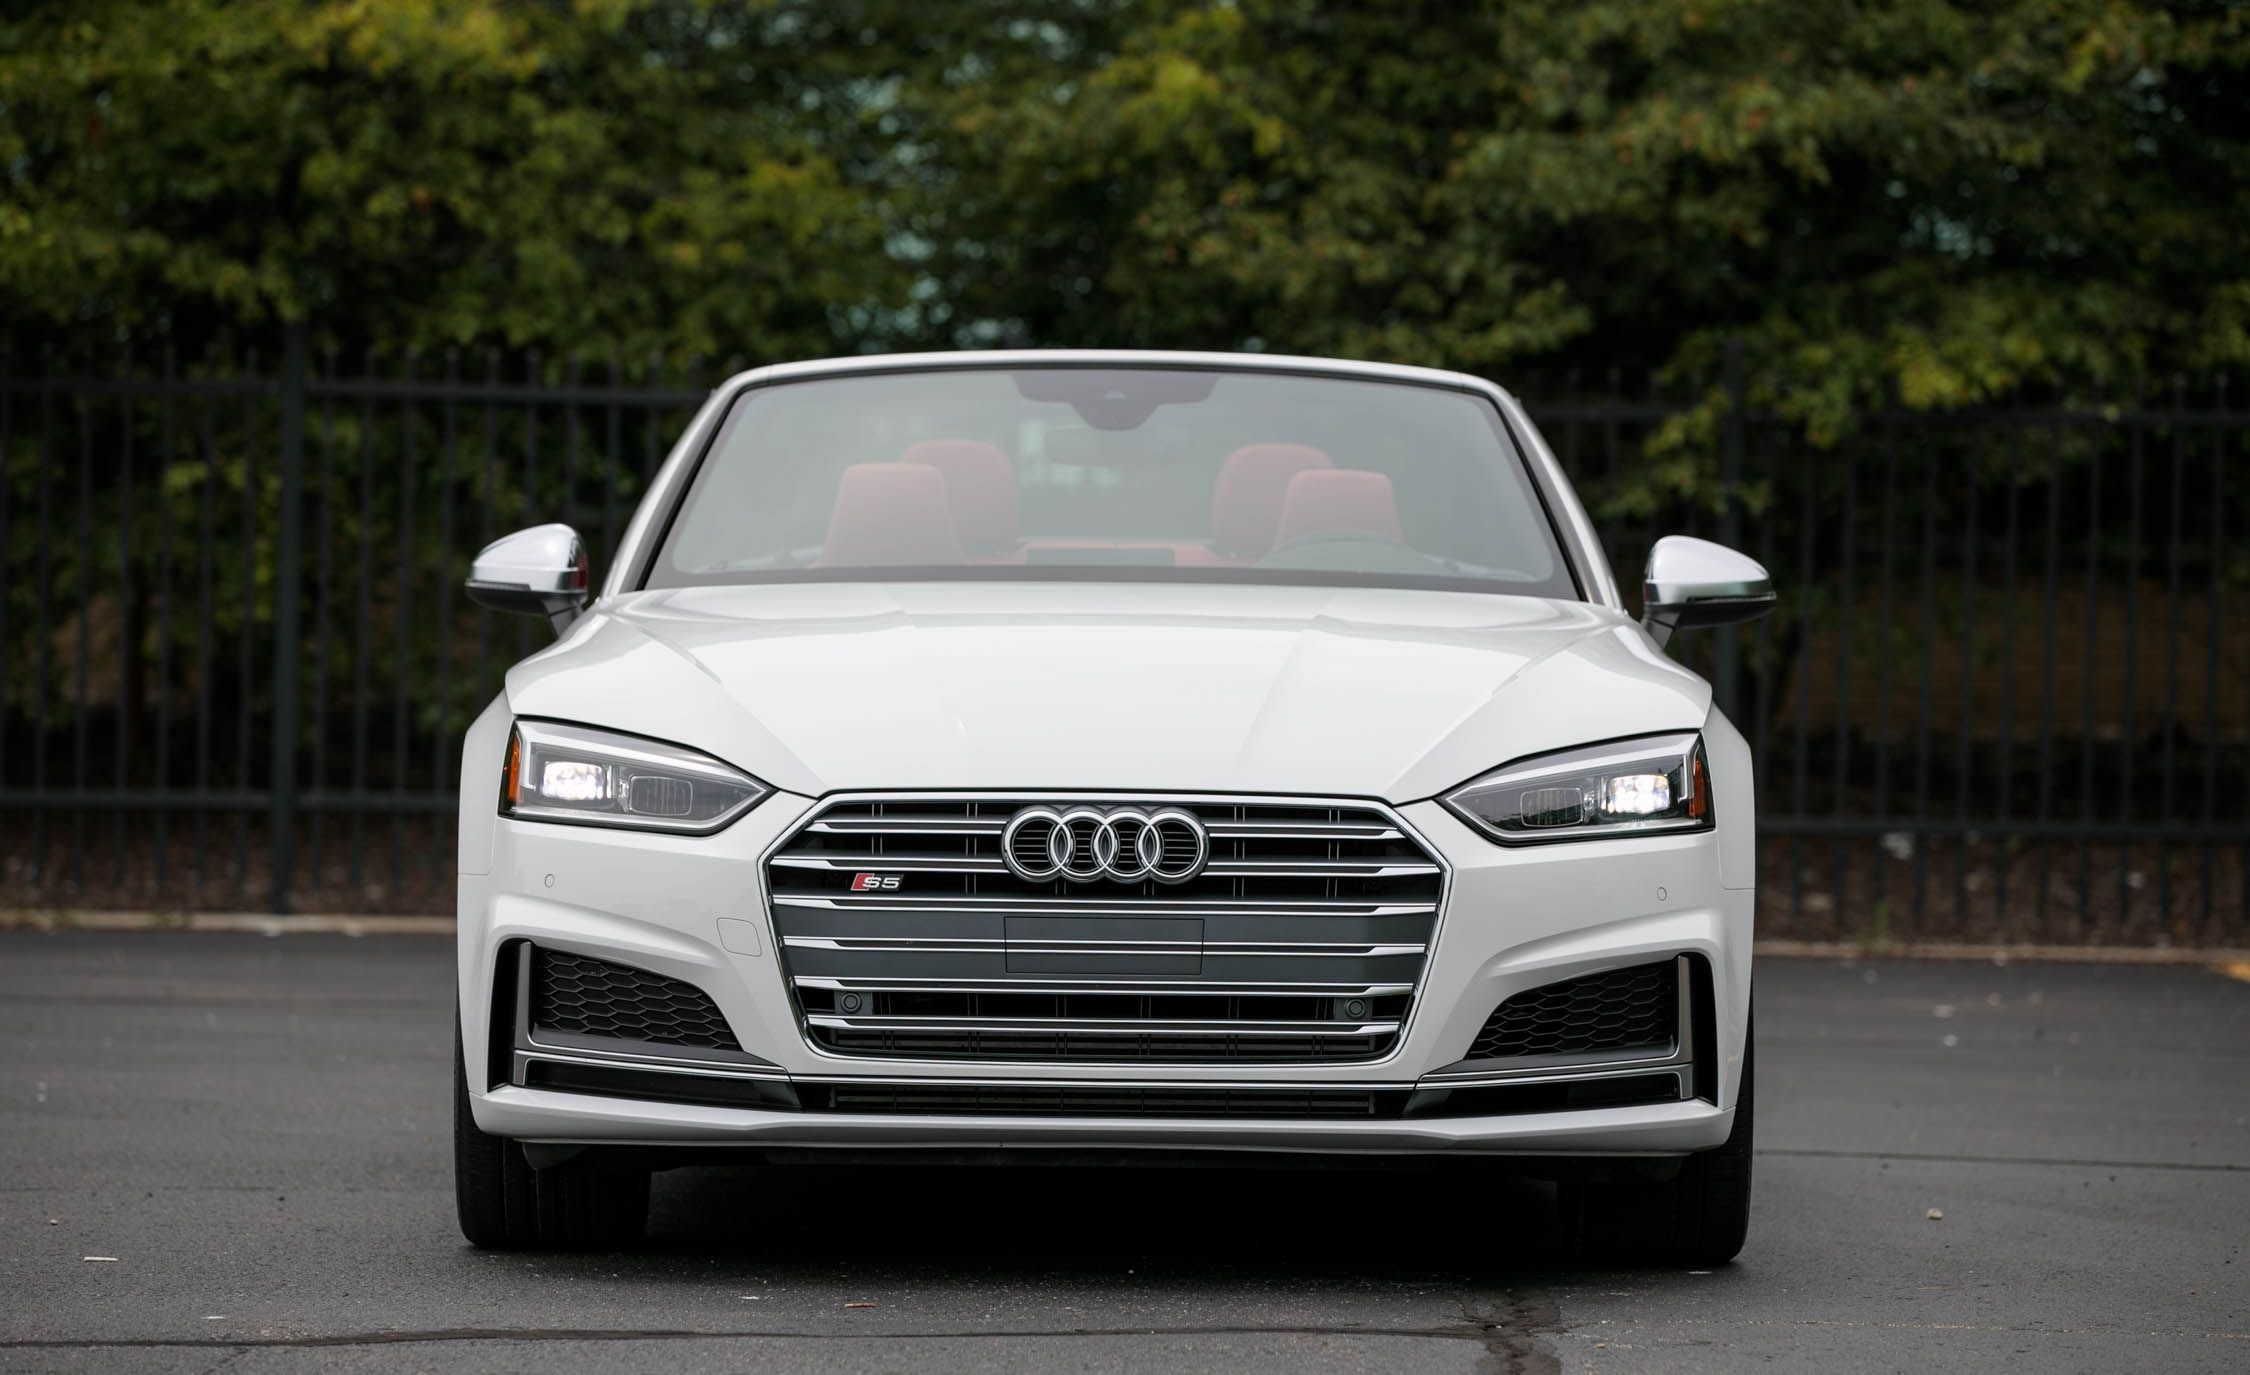 Audi S Reviews Audi S Price Photos And Specs Car And Driver - Audi 5 car